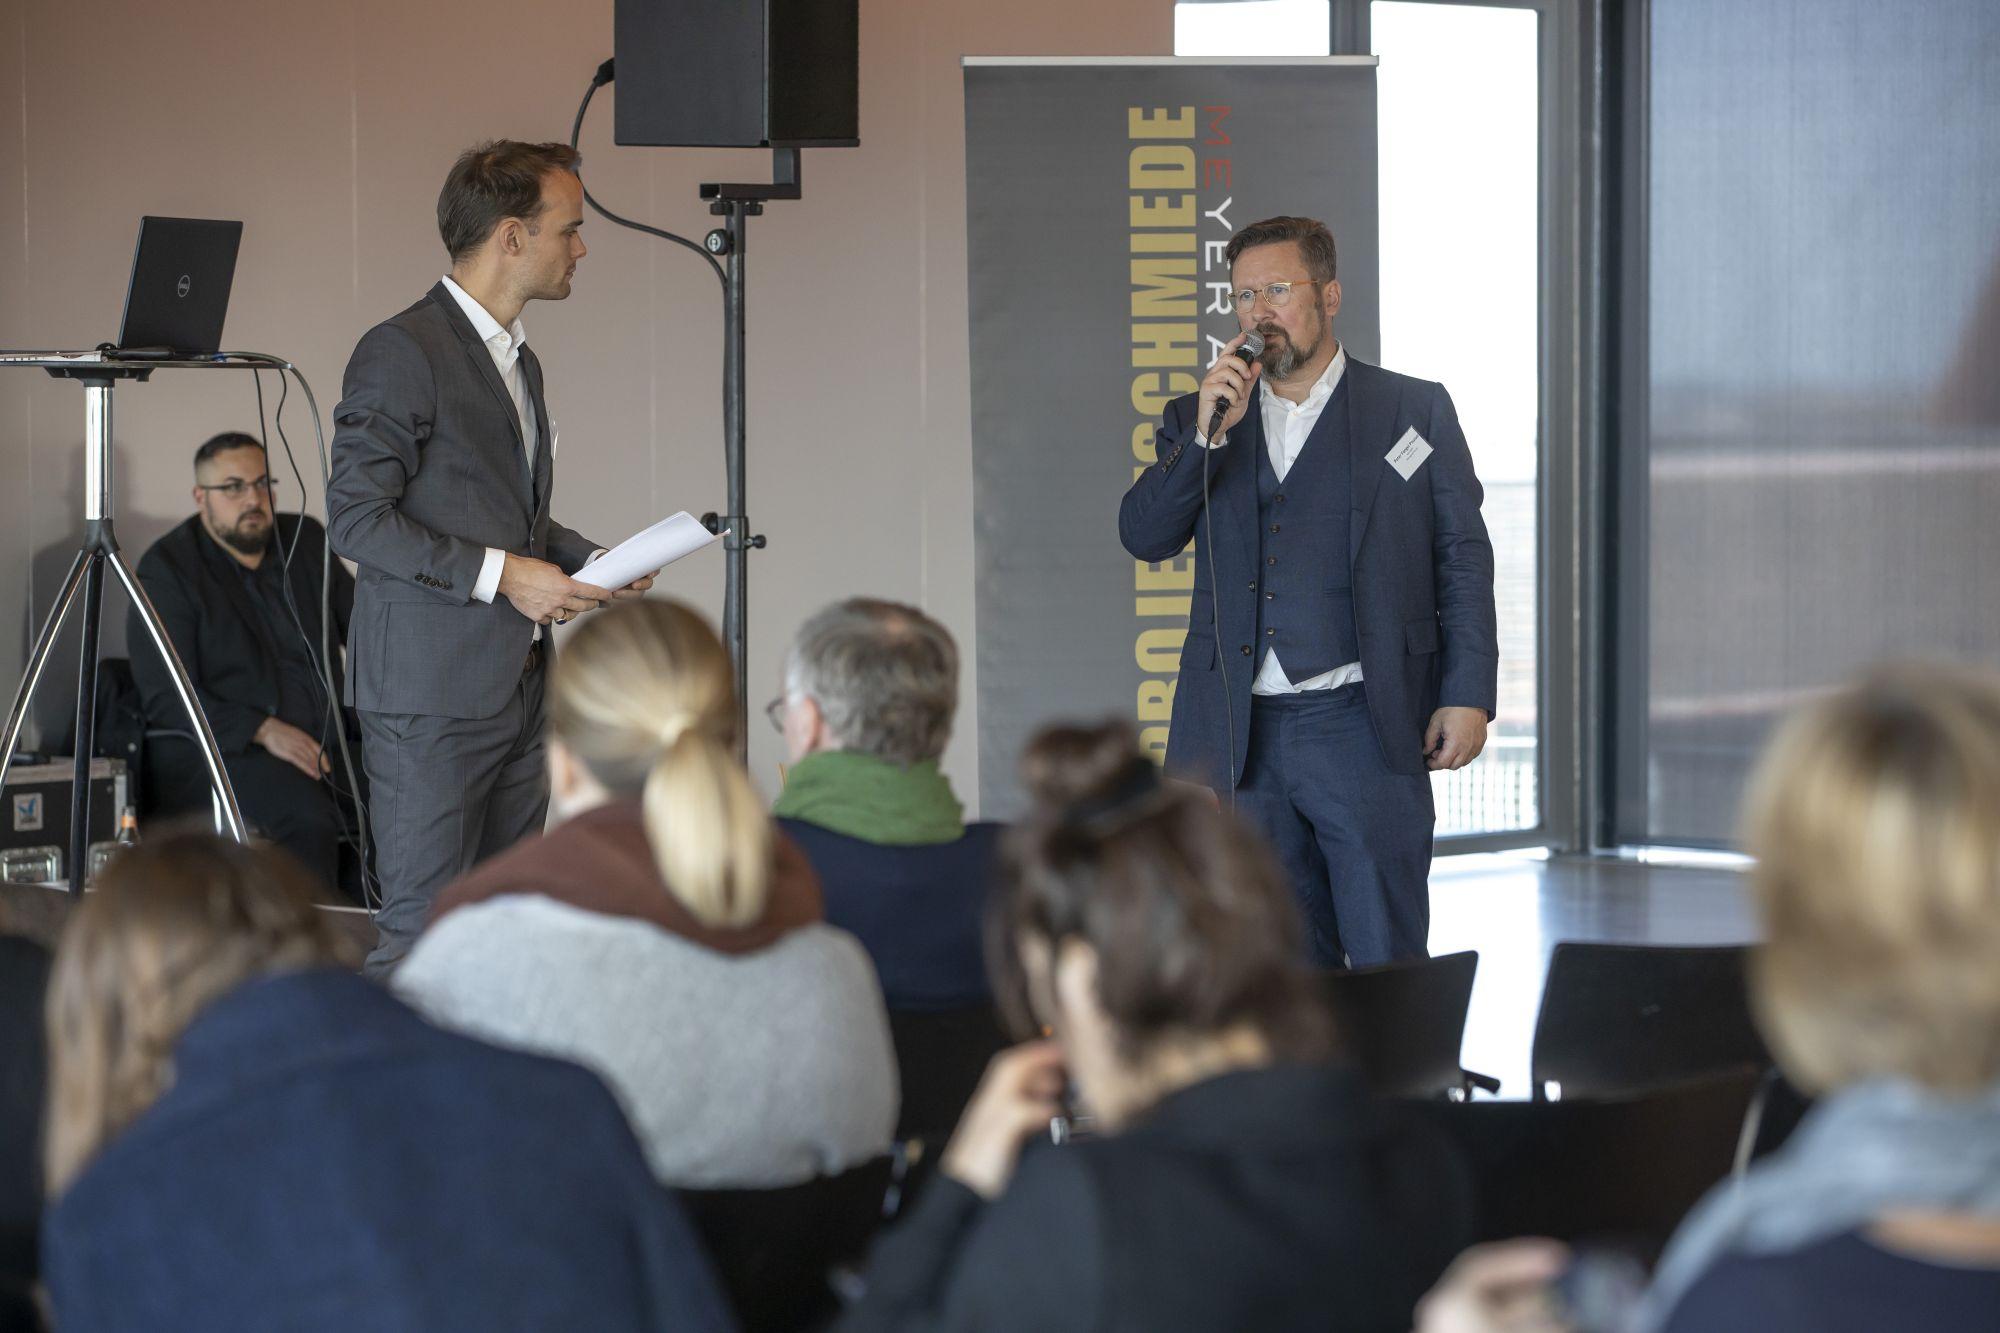 Panel-Moderator Dr. Pablo v. Frankenberg mit Referent Peter Fangel Poulsen (Kopenhagen)